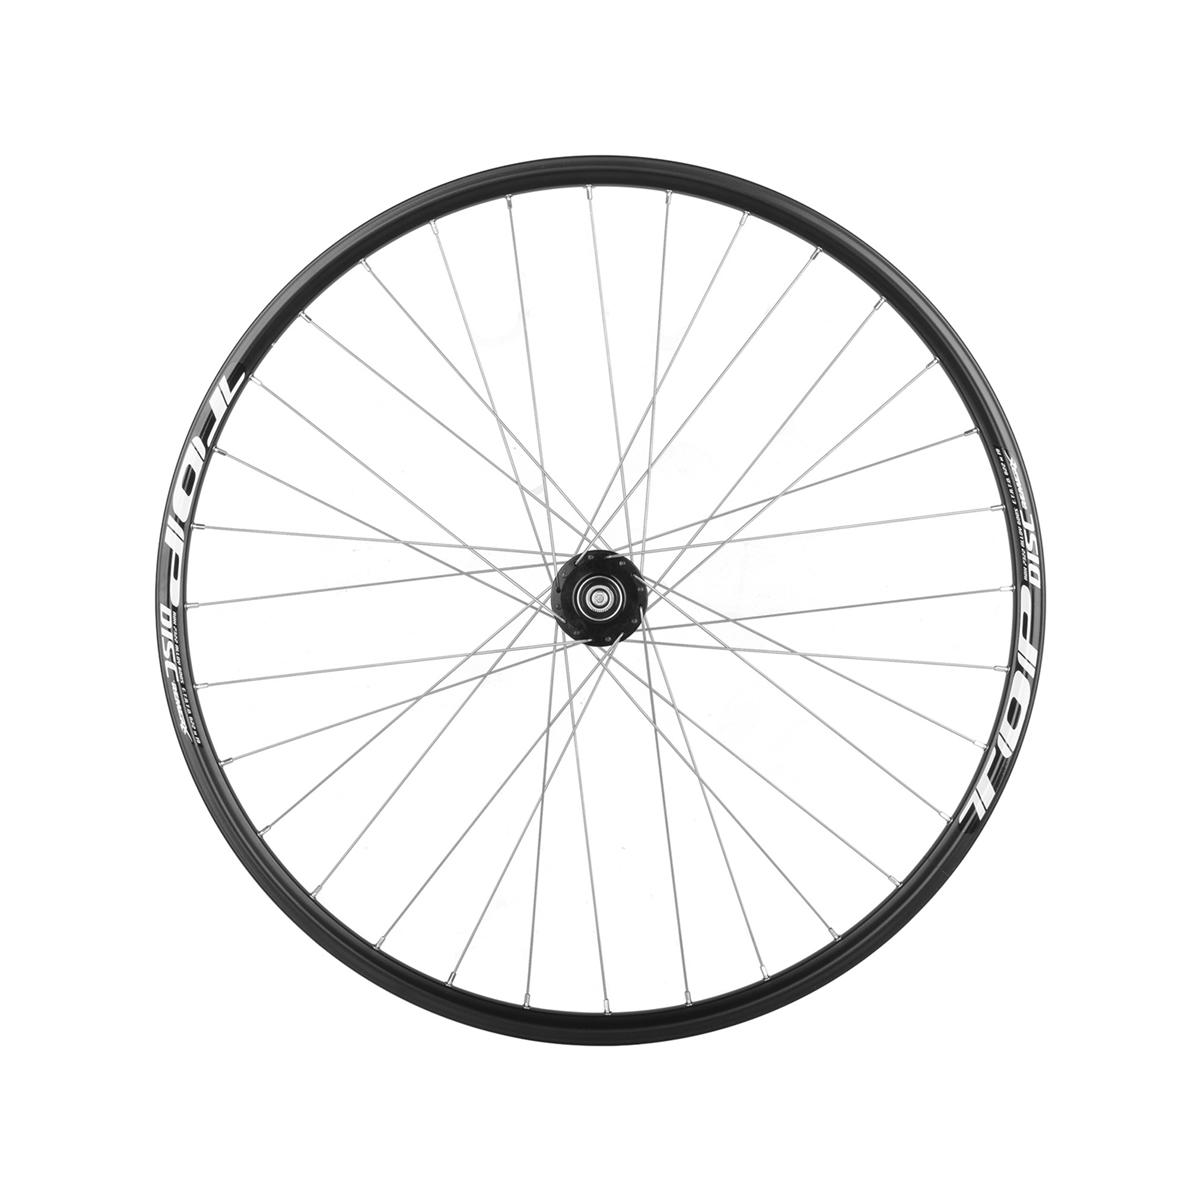 Front Wheel 2.19 Trekking 28'' 32H Disc Brake Quick Release Black